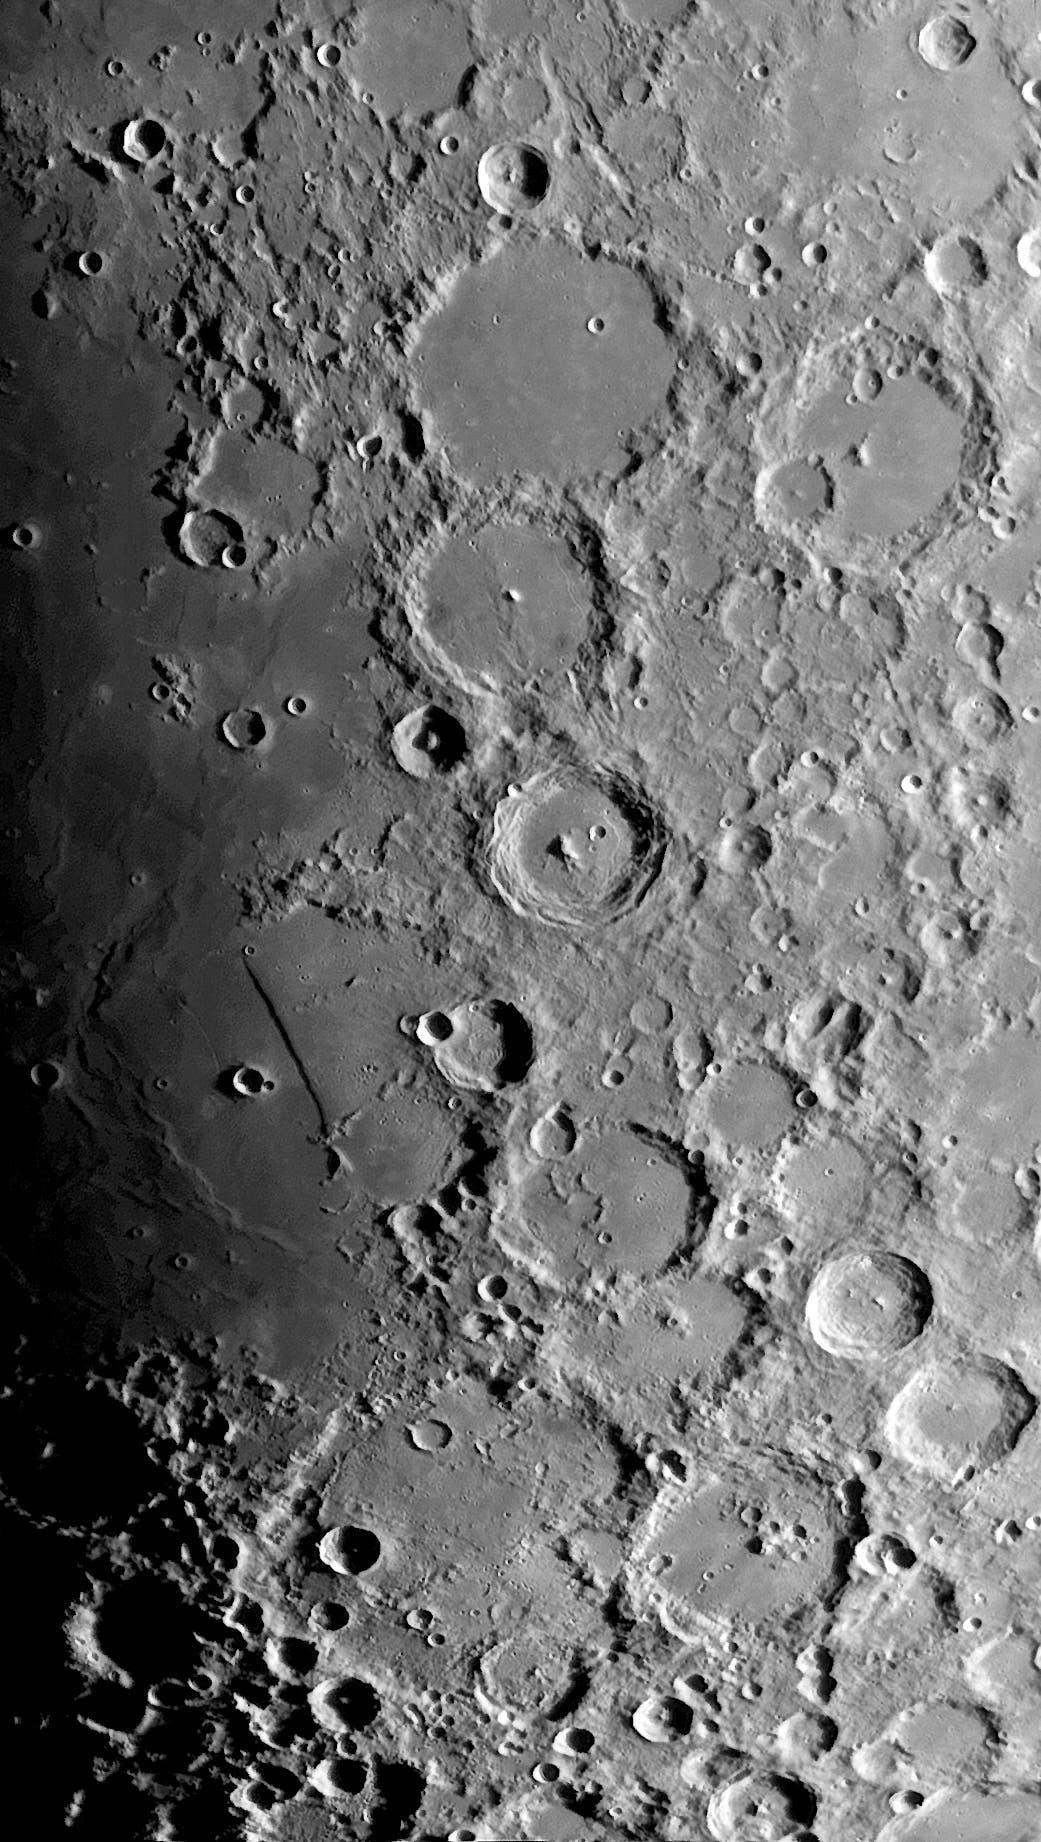 Der Mond am 16. November 2018